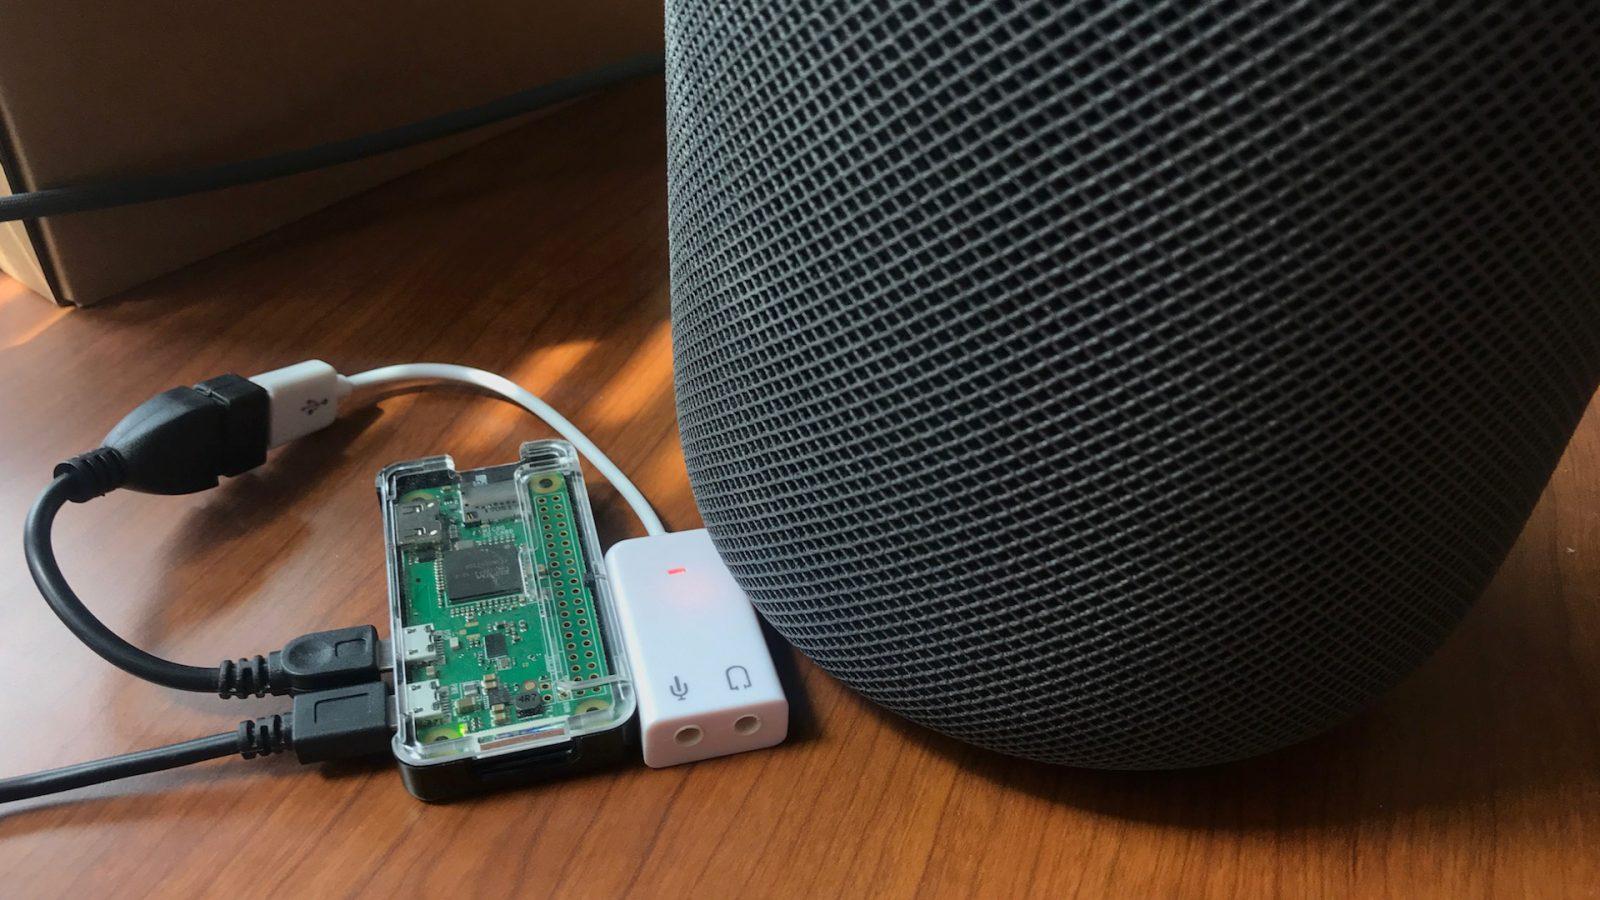 Raspberry Pi makes HomePod work with Spotify, Pandora etc